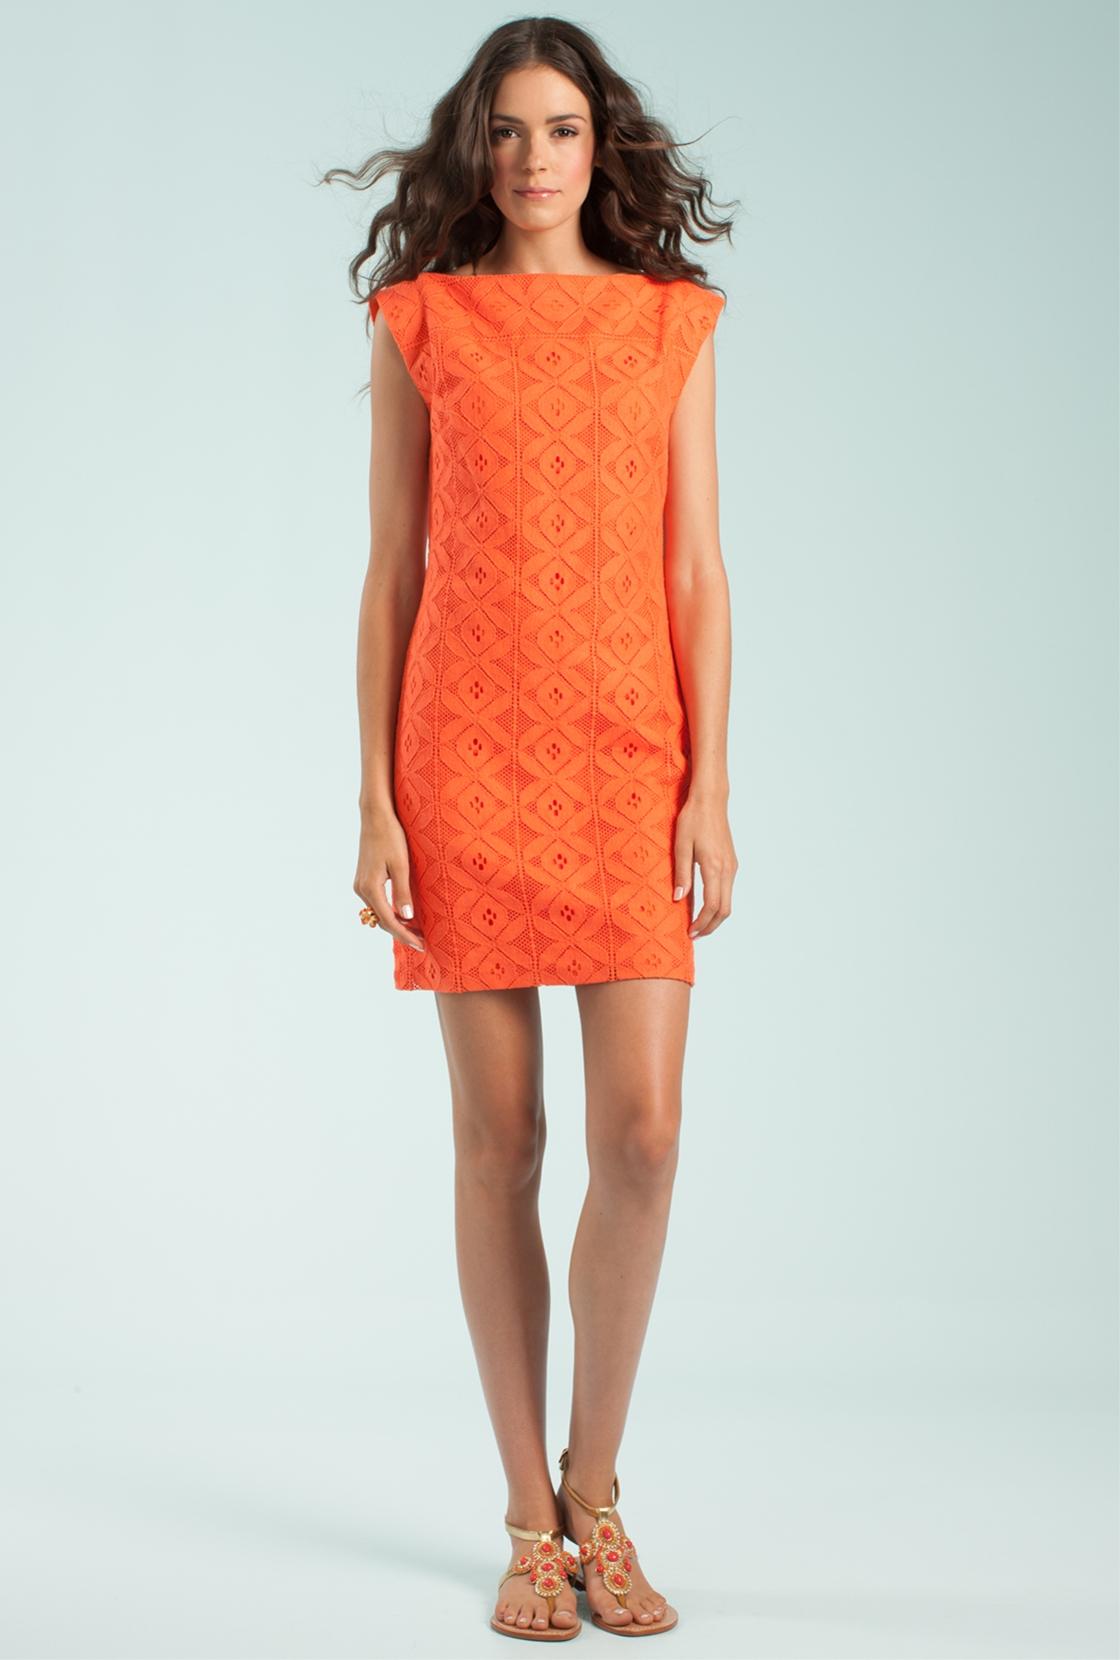 6739dda74e834d Trina Turk Almost Paradise Dress in Orange - Lyst